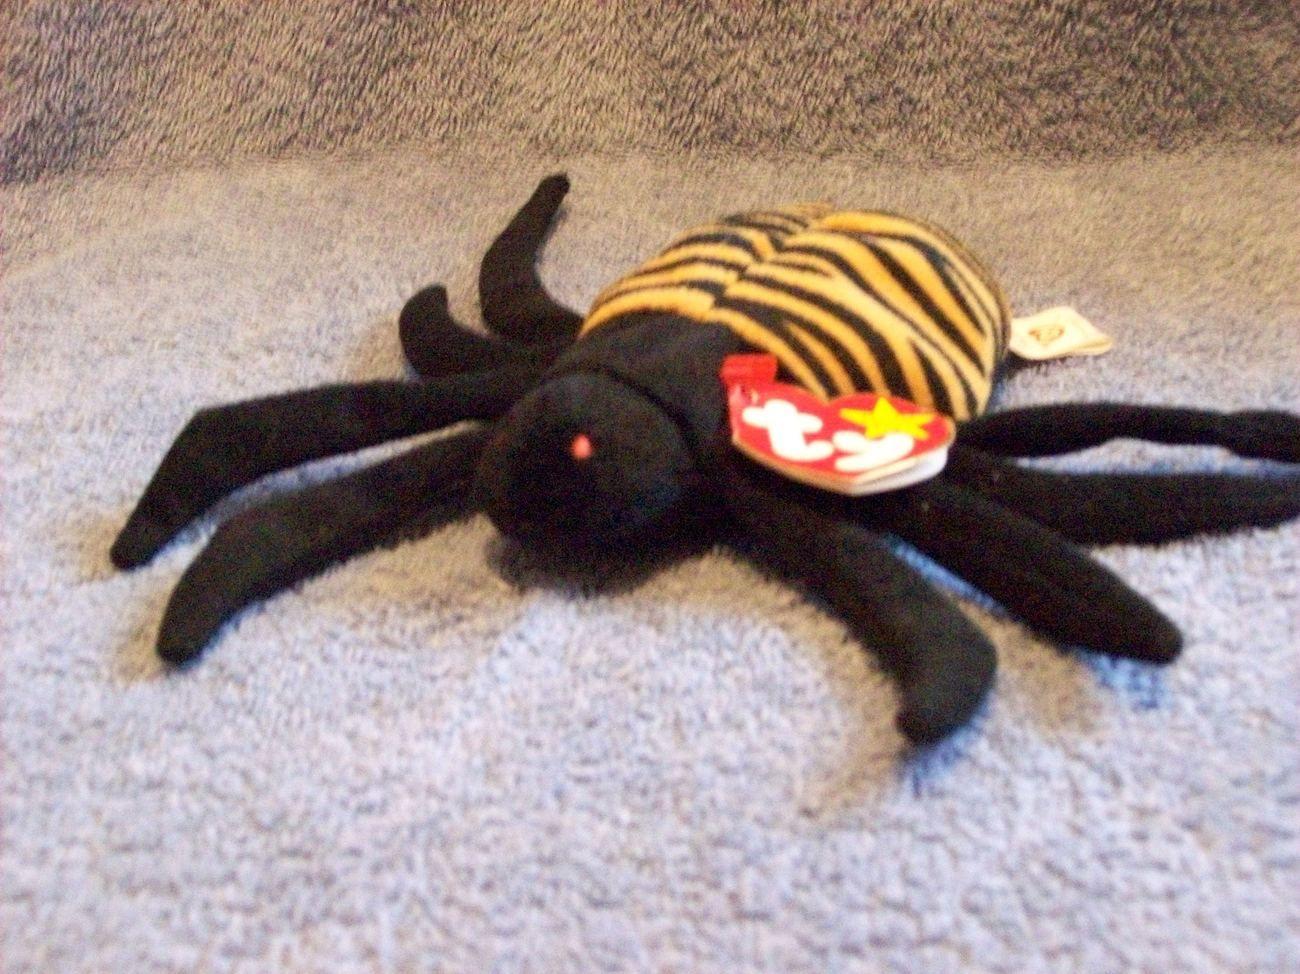 826217ebc2d Spinner The Spider Ty Beanie Baby 4th Gen Tag Retired  Dena Aksel ~  JDsGiftShack